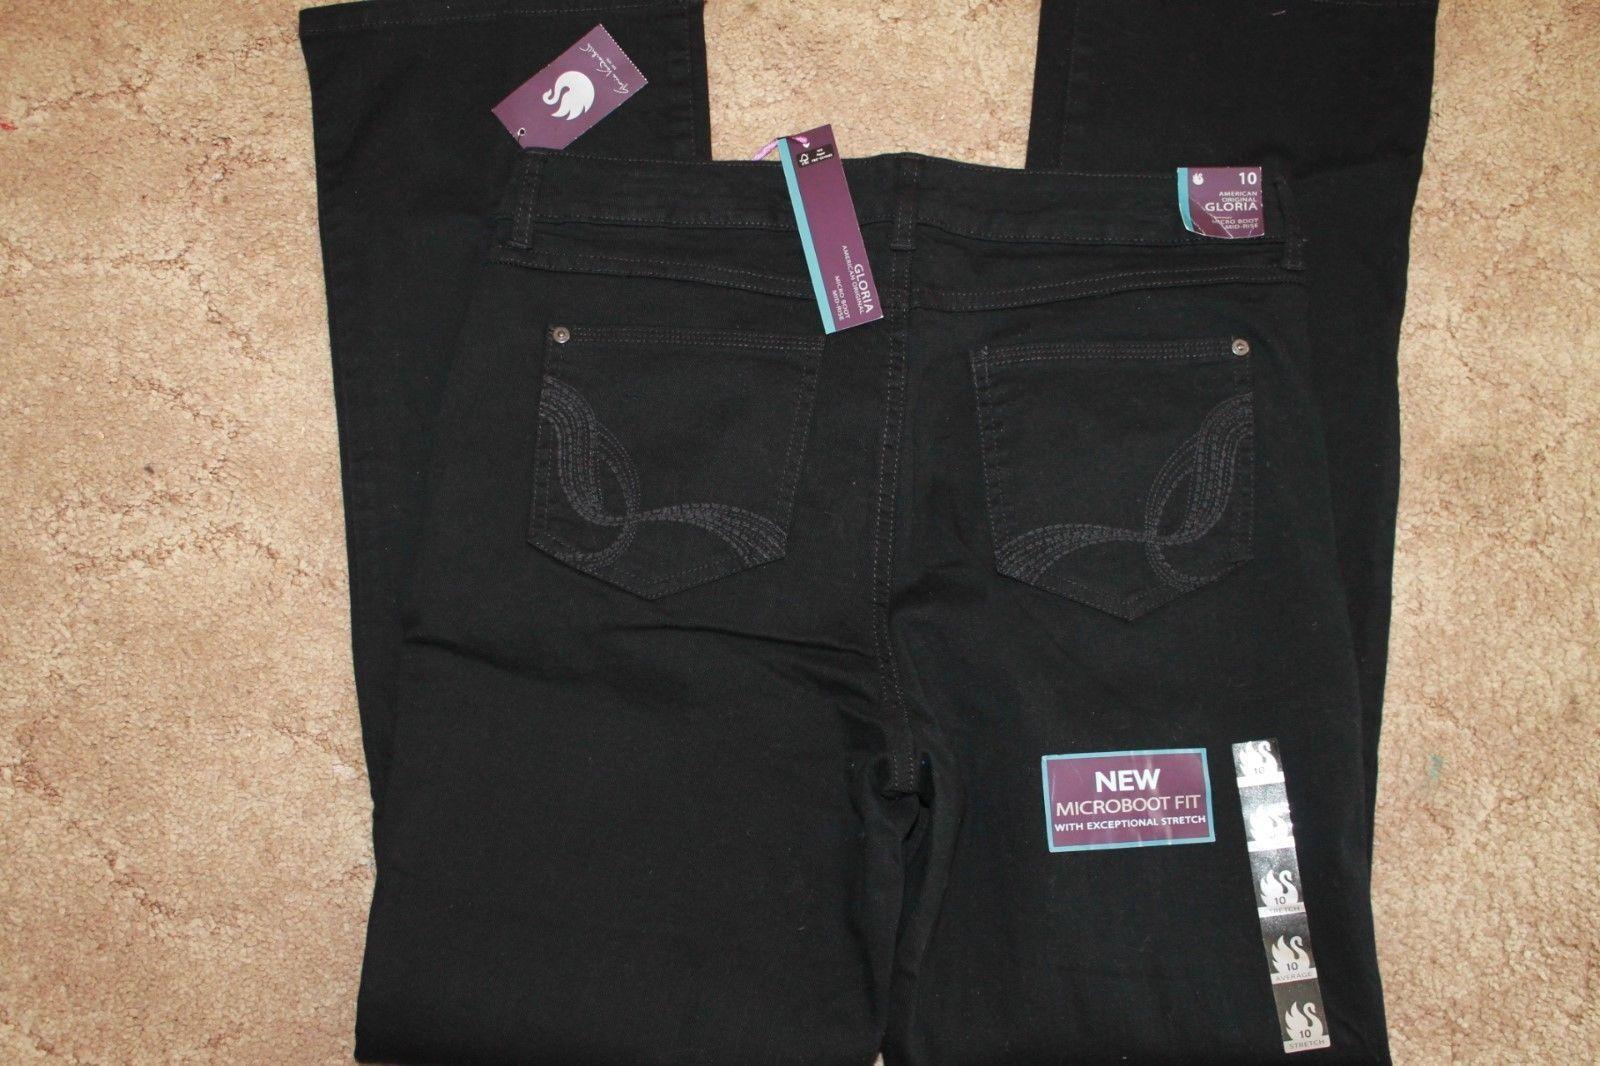 f47c528481168 Gloria Vanderbilt Women s Microboot Jeans Black Size 16 Short